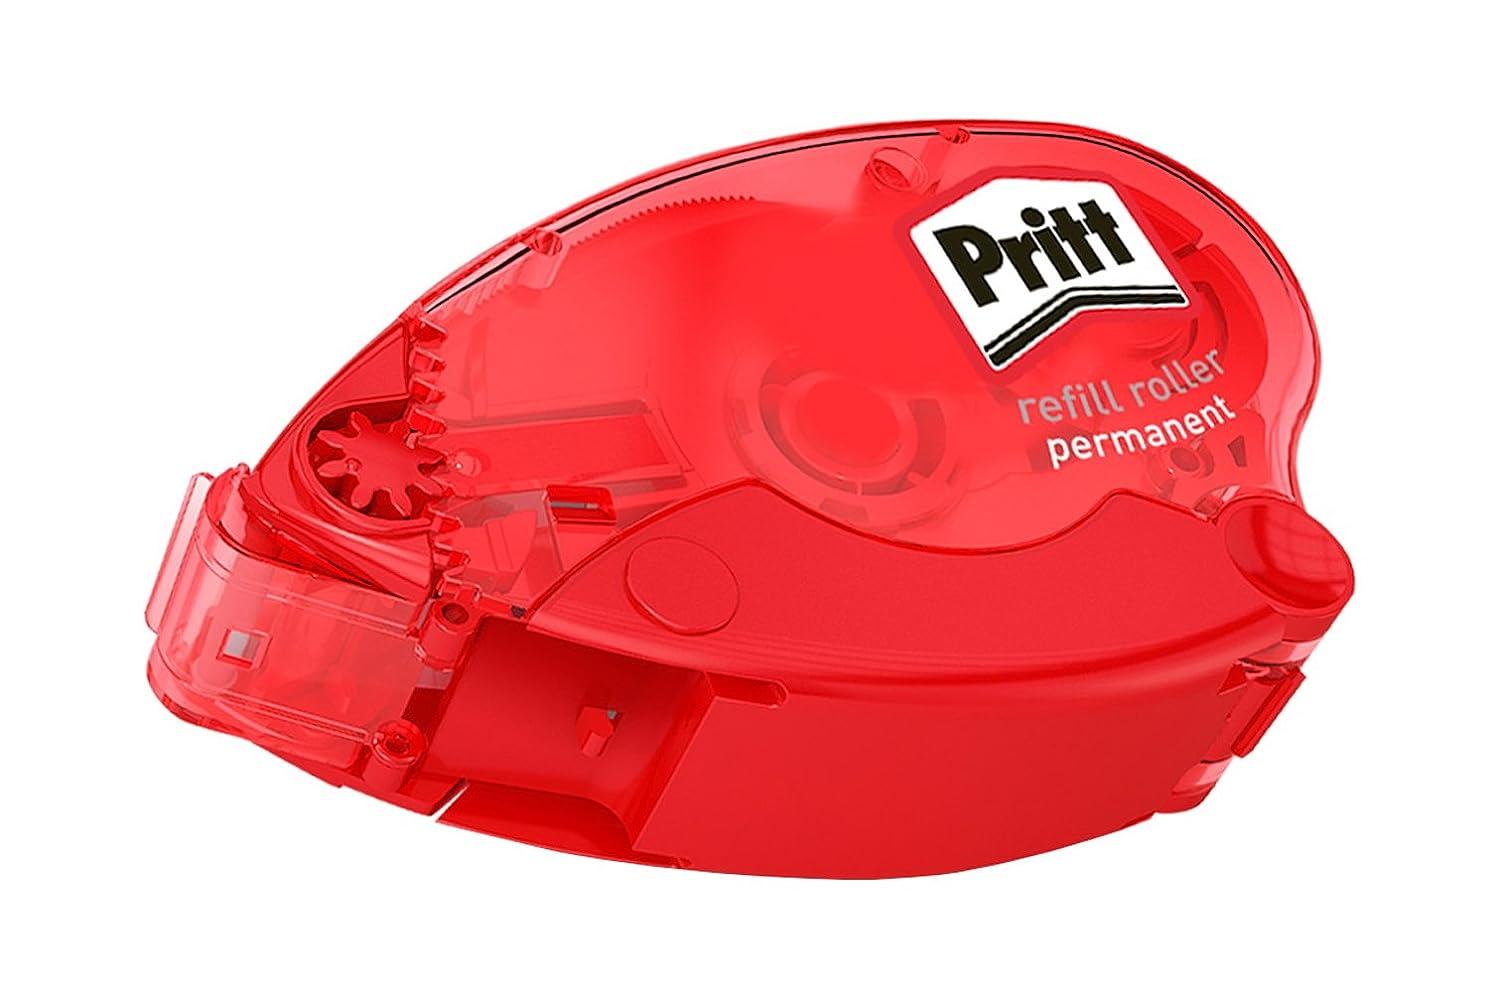 Pritt HK2340 8.4mm x 14m Permanent Roller Adhesive